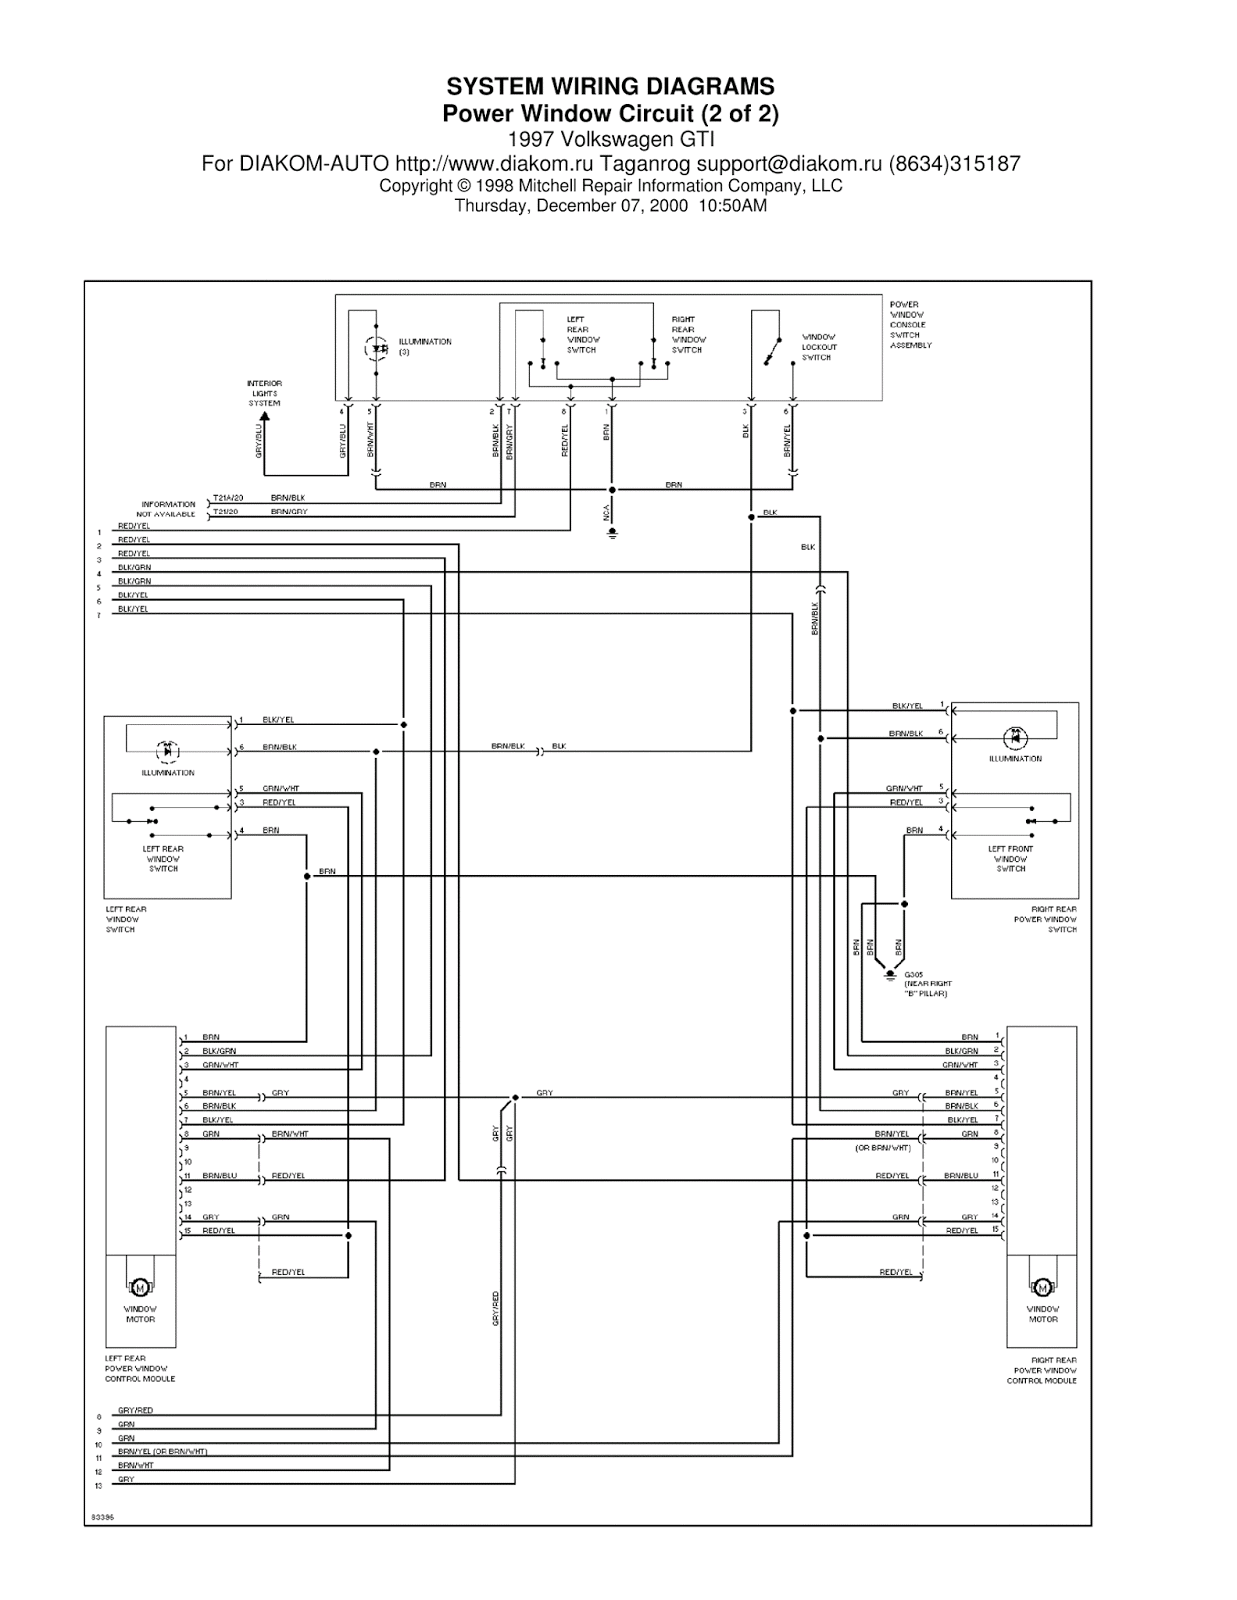 1997 Volkswagen GTI Power Window Circuit SYSTEM WIRING